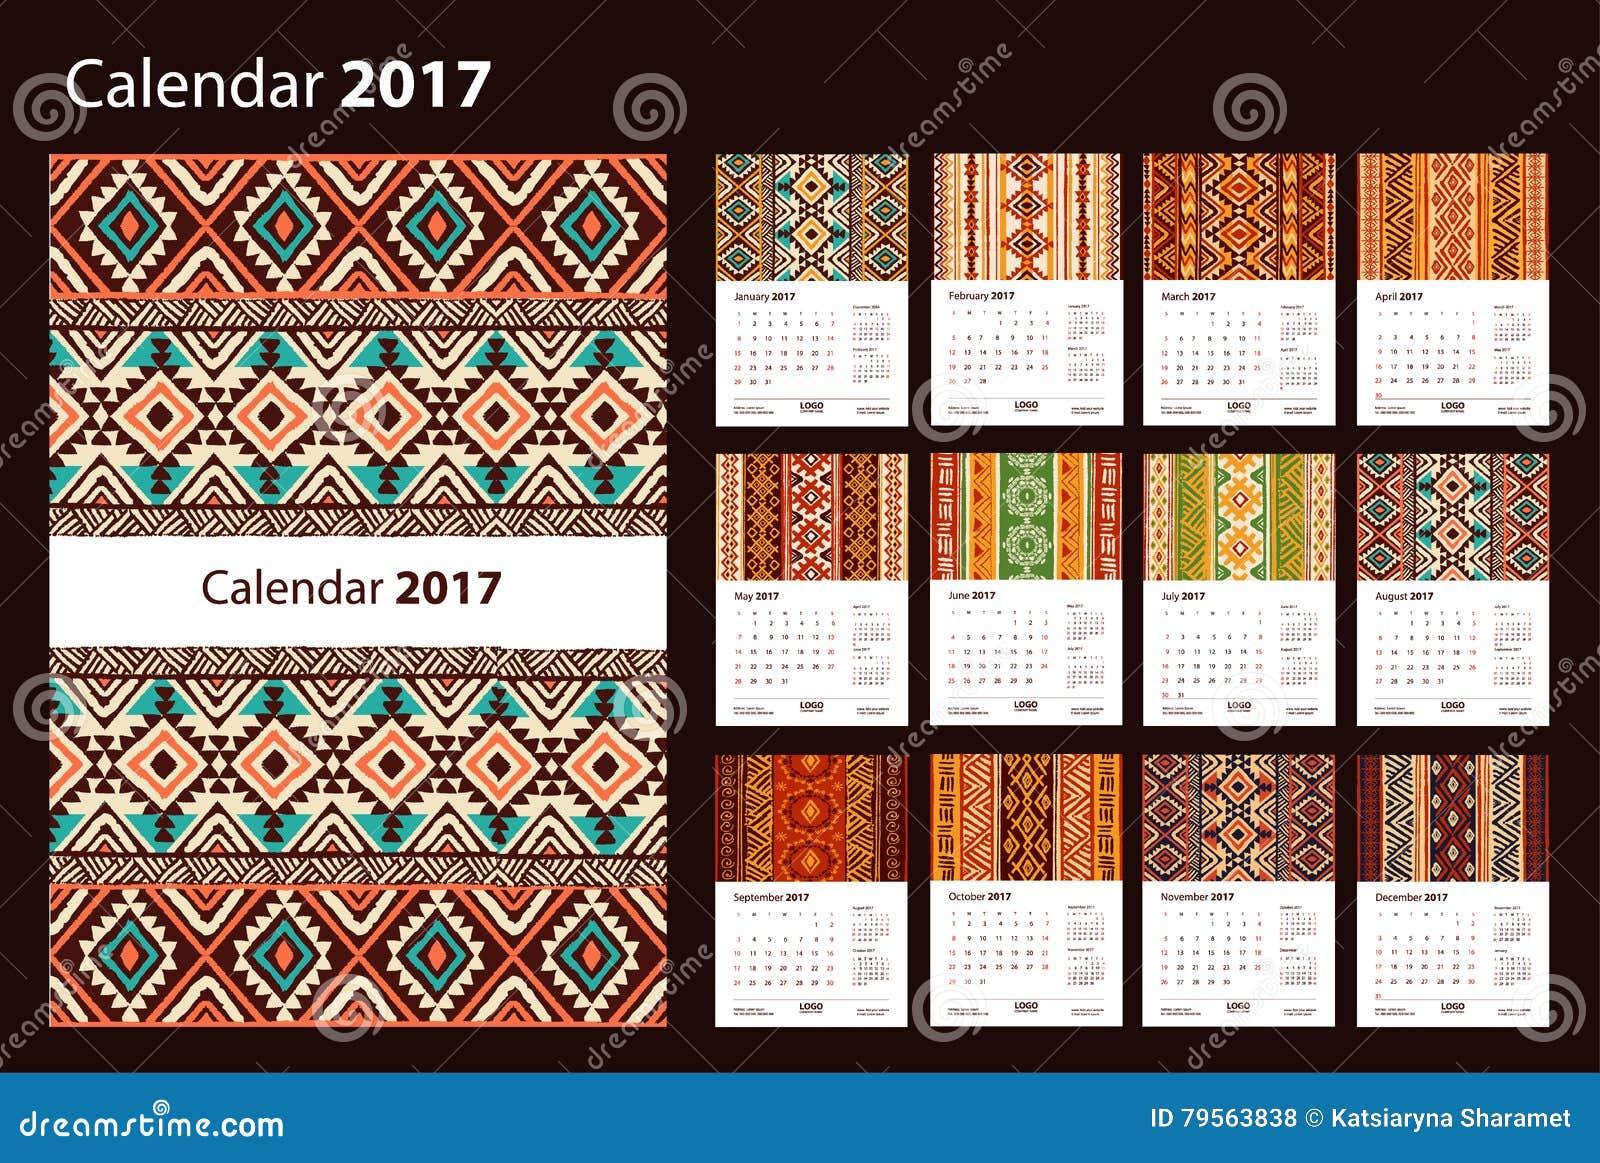 Calendar 2017 starting from Sunday. Ethnic geometric pattern.